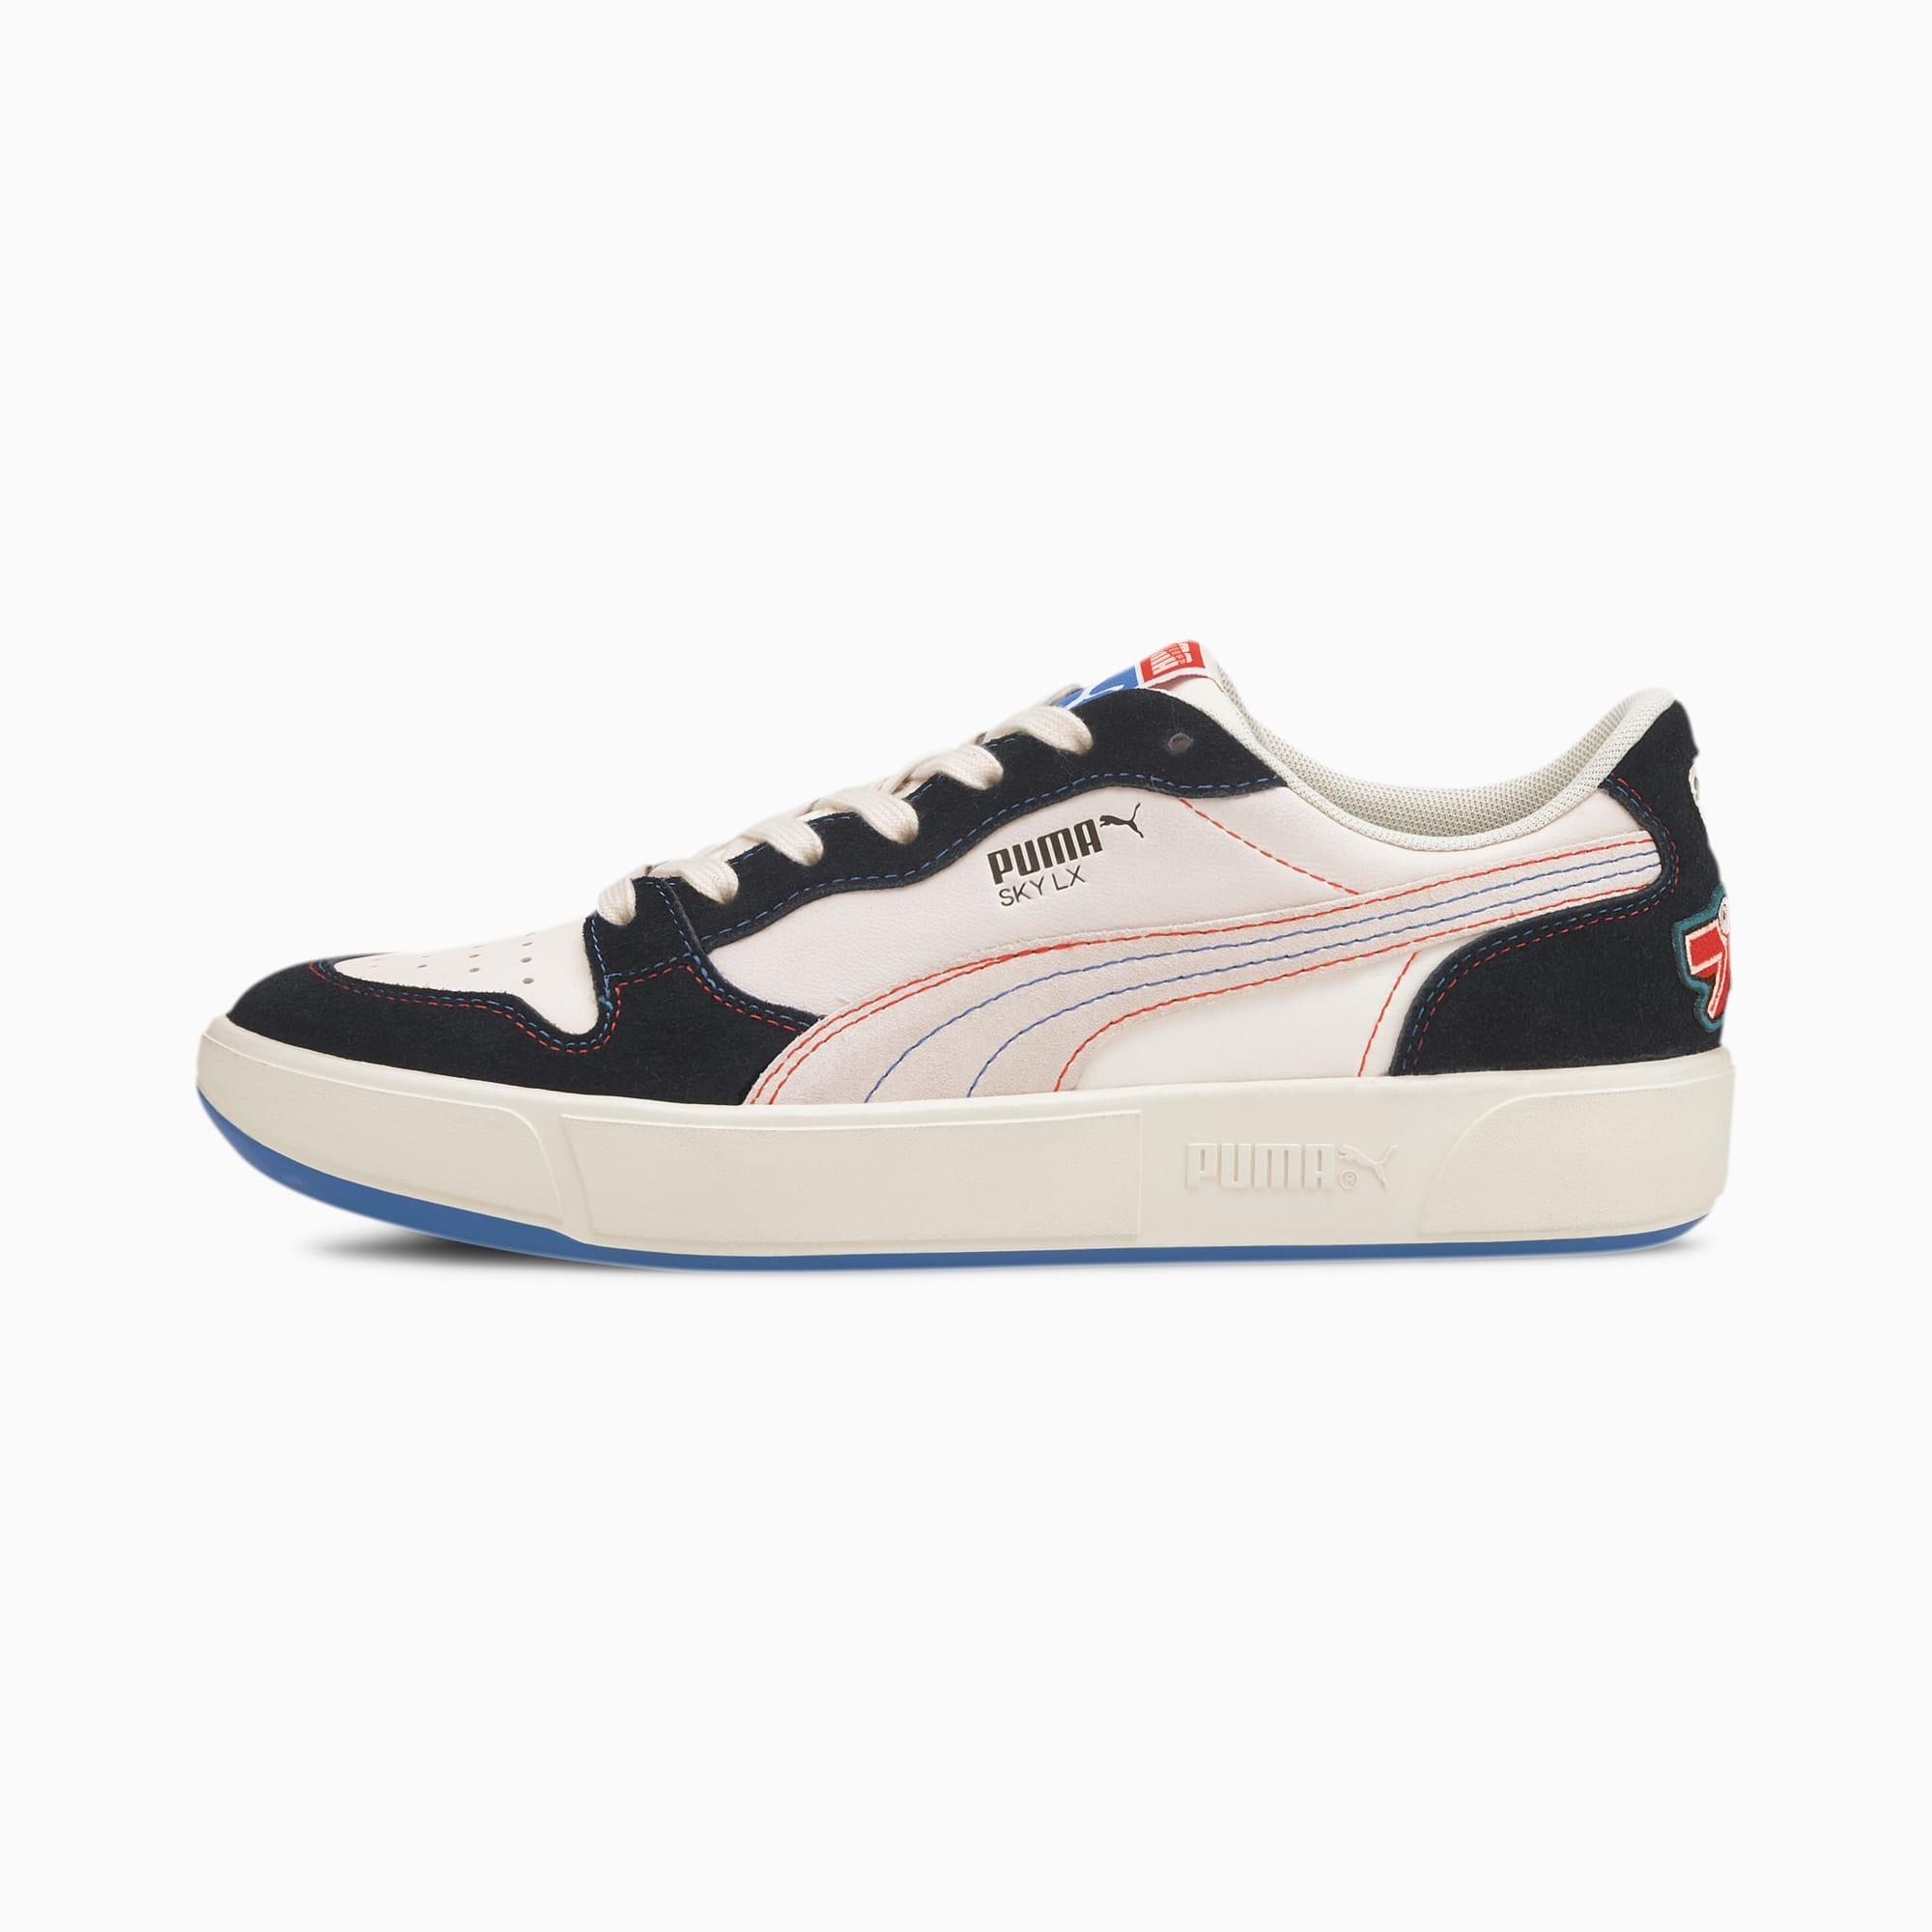 Sky LX Lo Japanorama Men's Sneakers   PUMA US